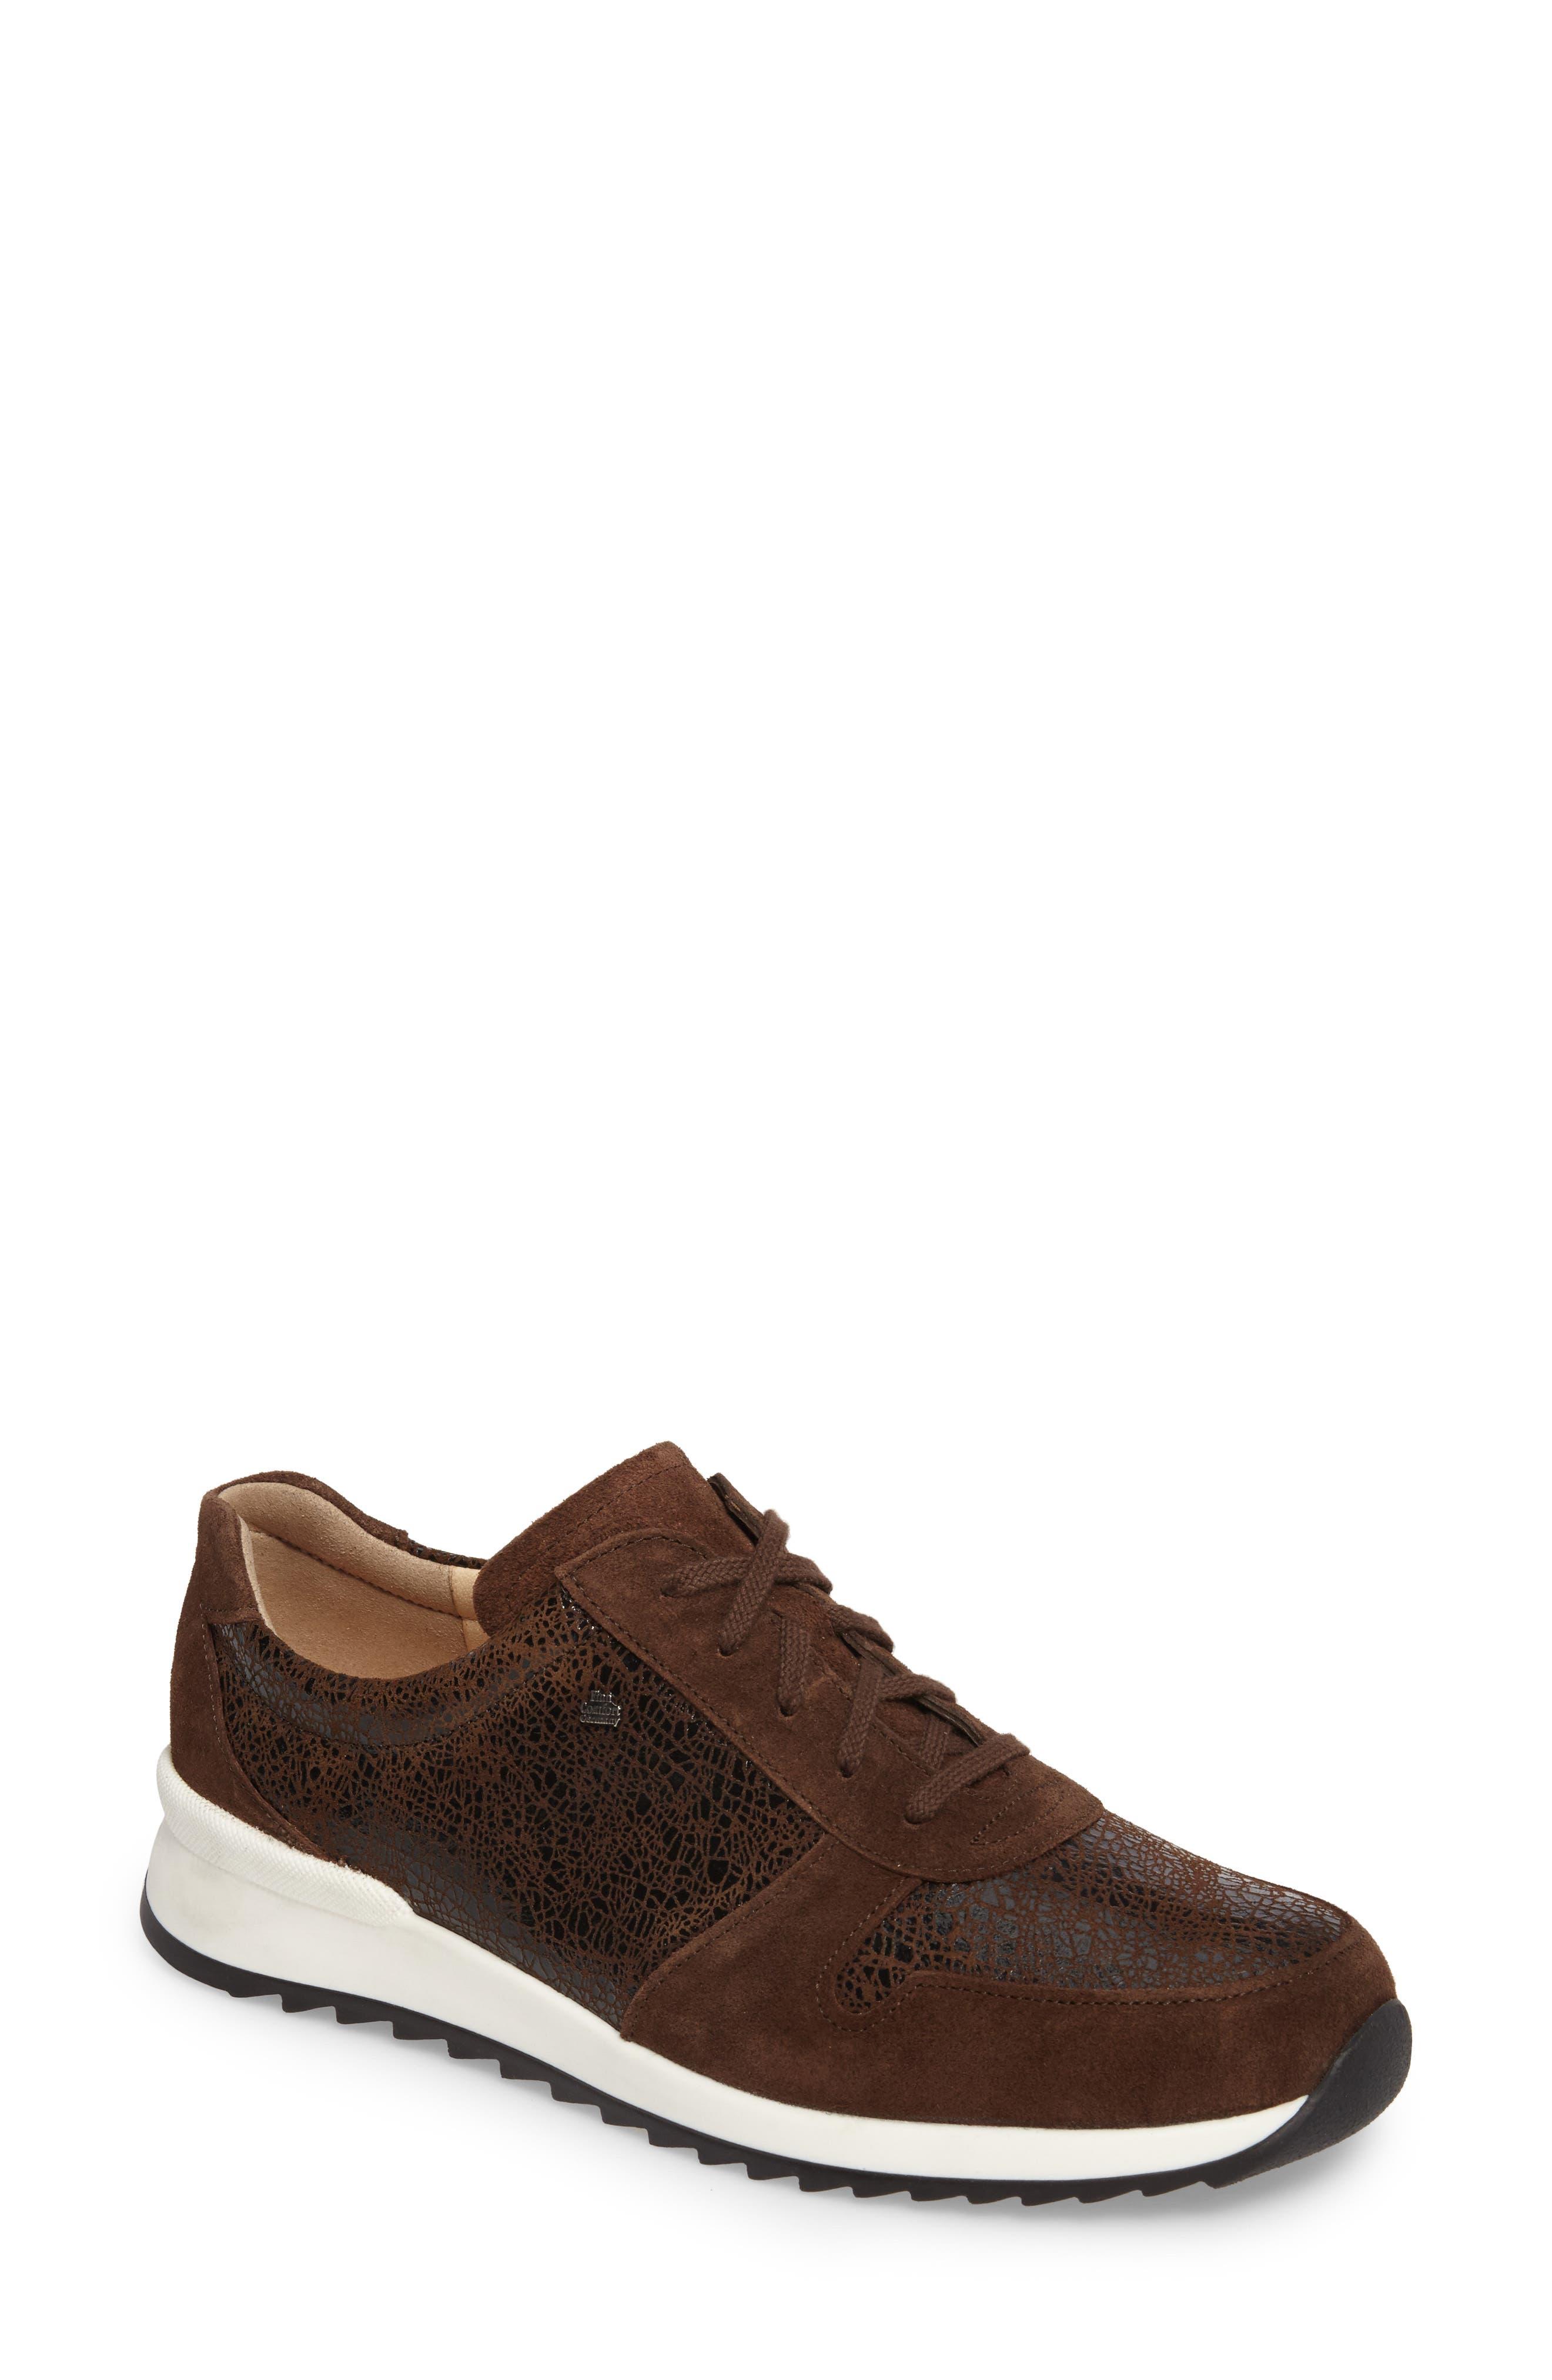 FINN COMFORT,                             Sidonia Sneaker,                             Main thumbnail 1, color,                             207